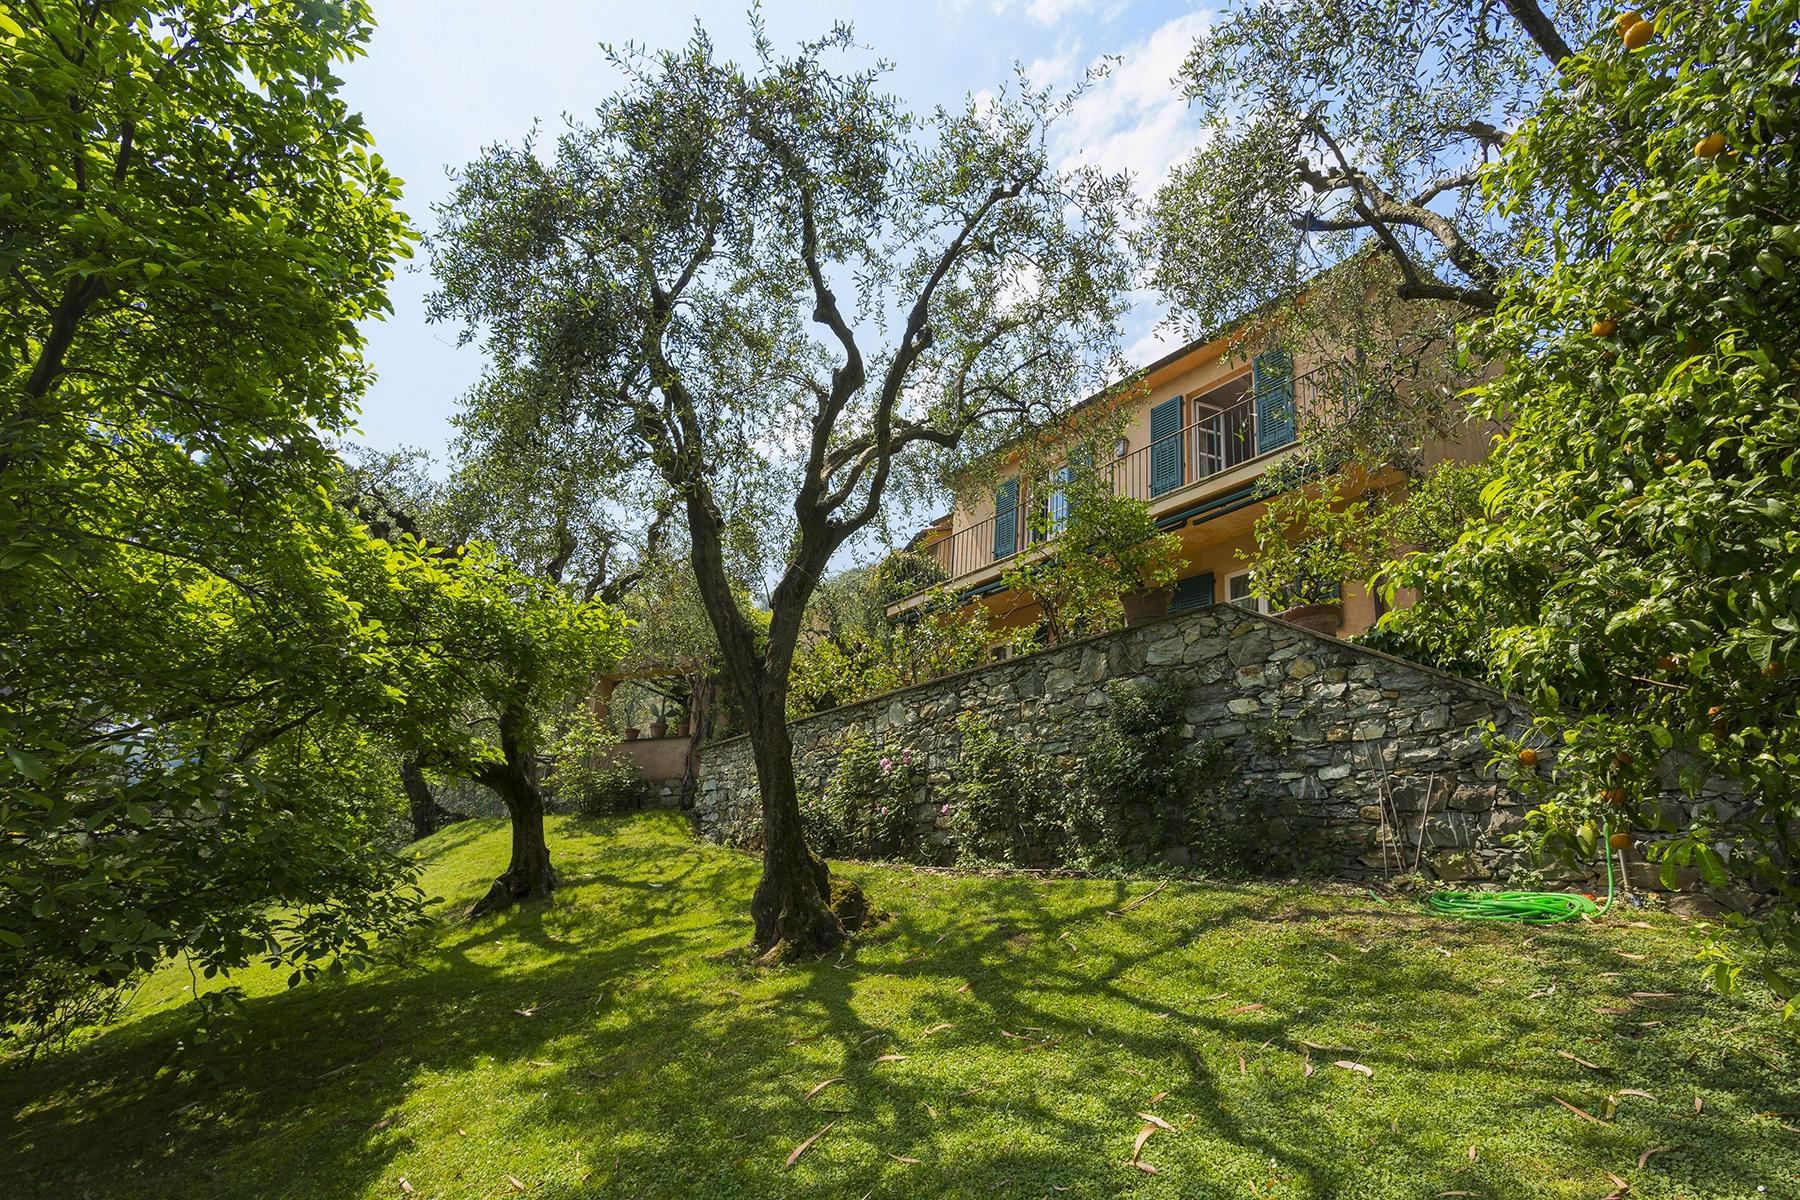 Villa in Vendita a Santa Margherita Ligure: 5 locali, 580 mq - Foto 12